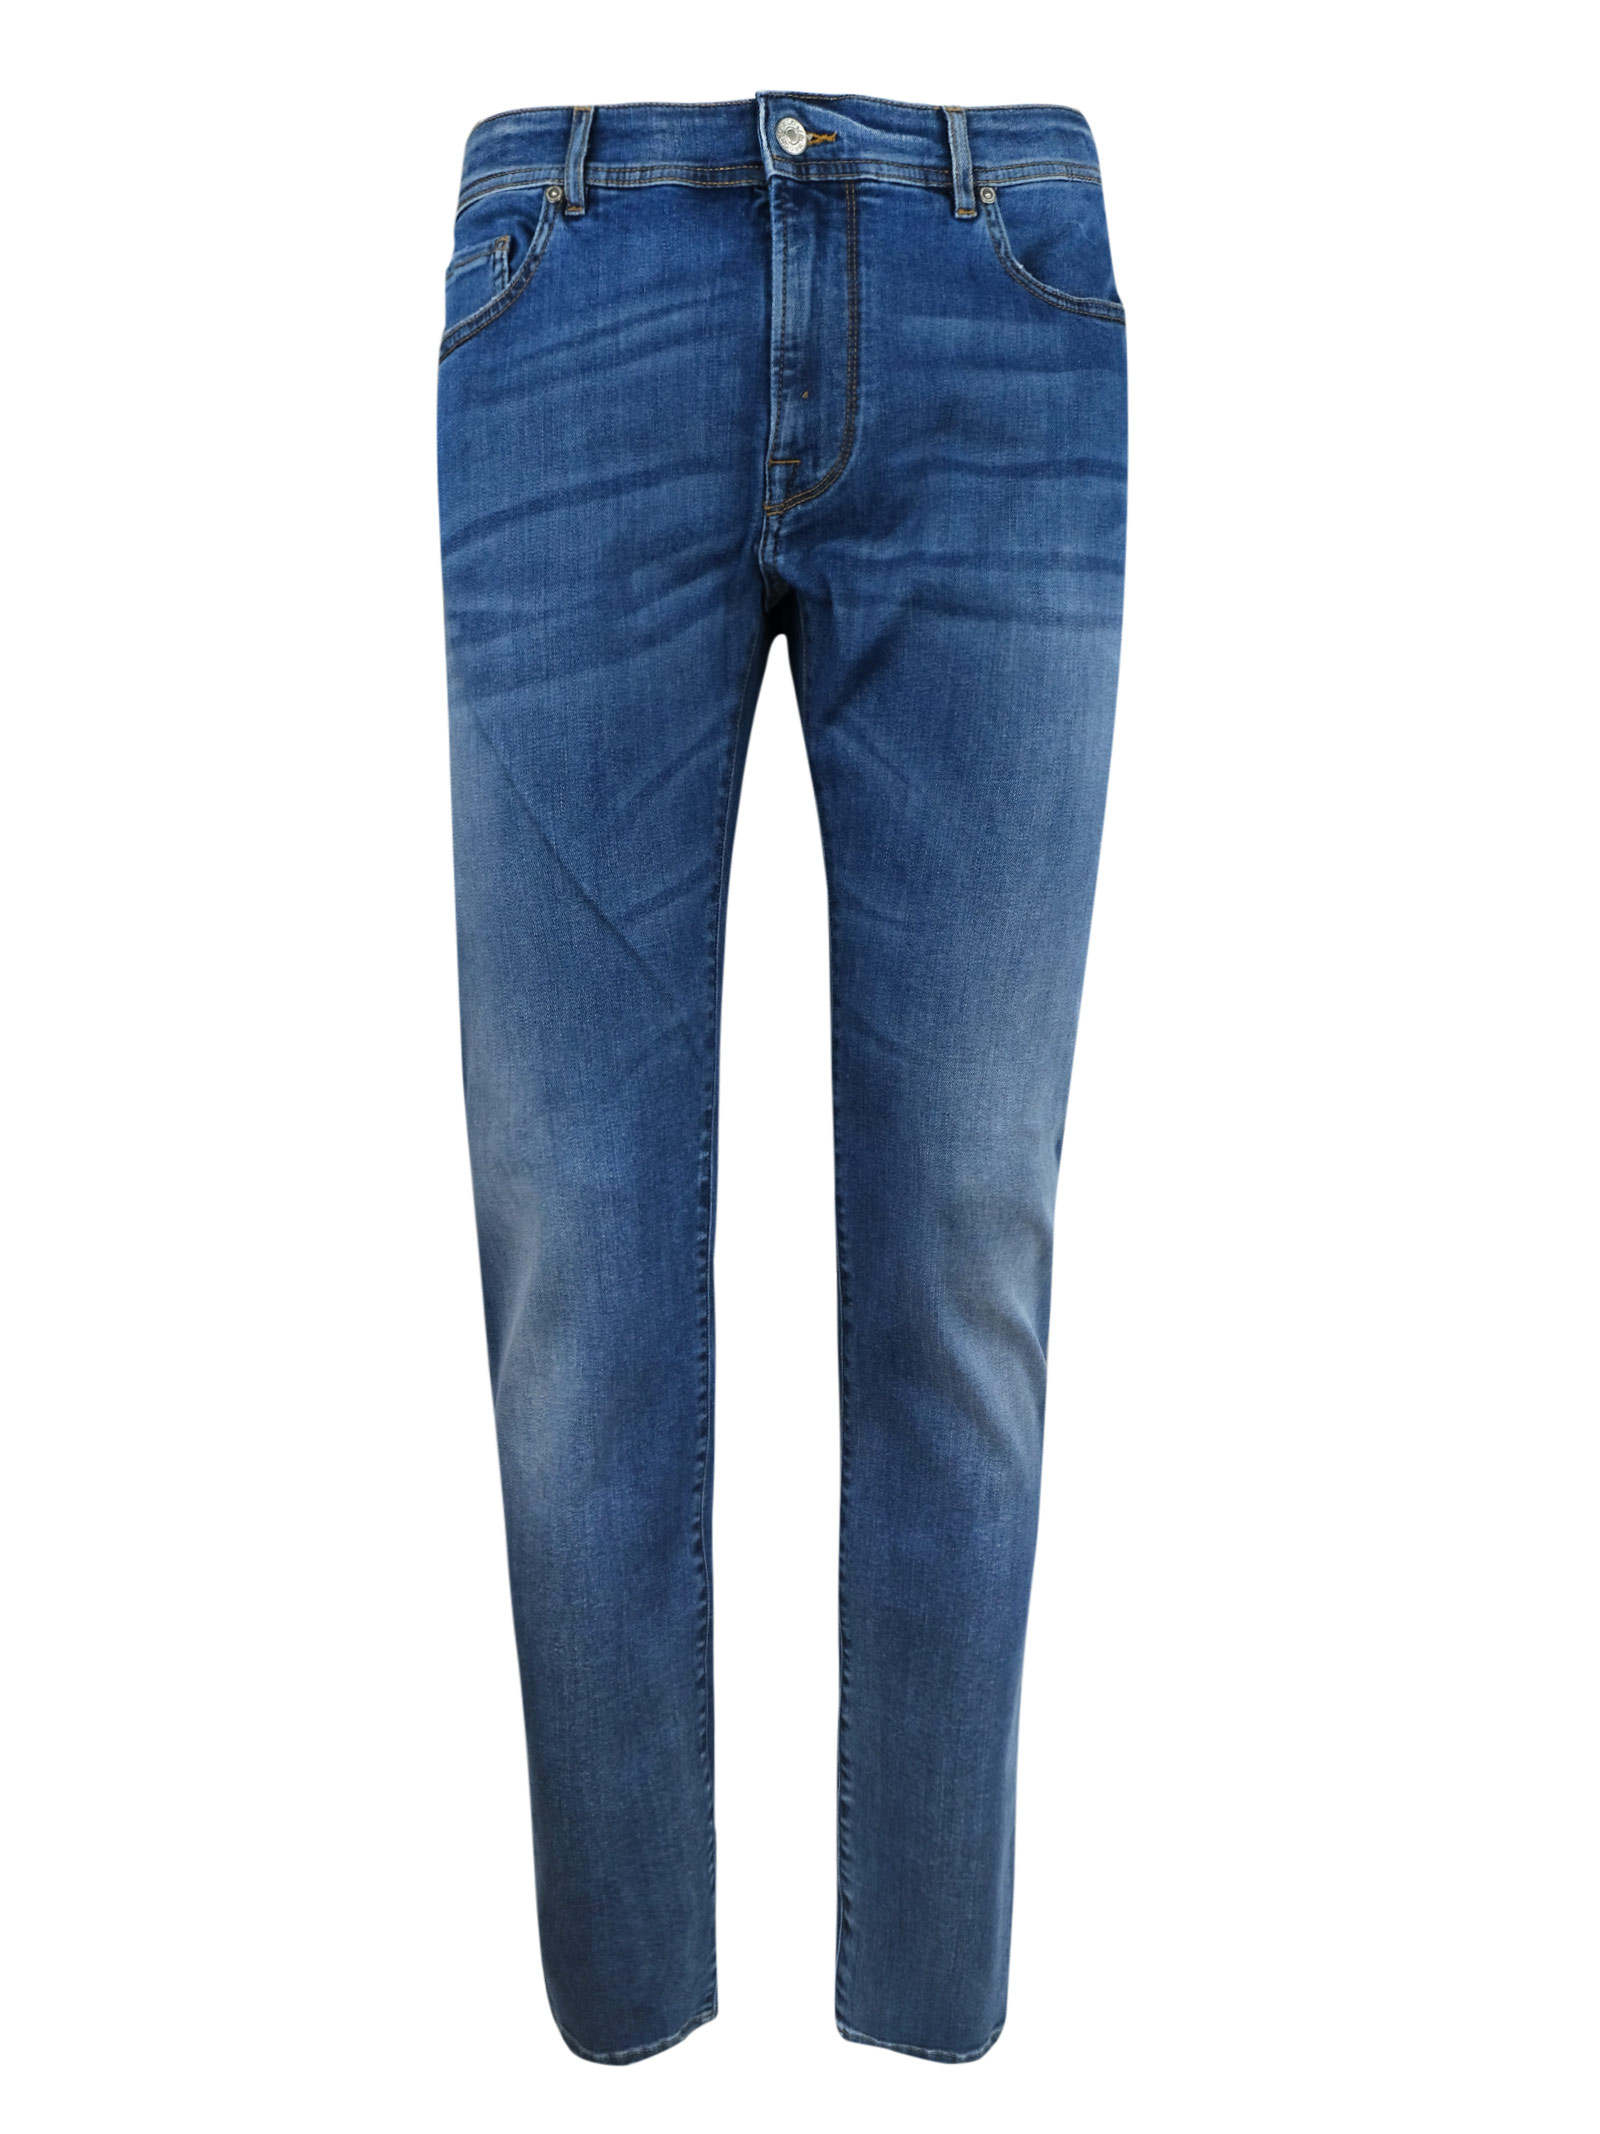 Medium rinse denim BROOKSFIELD | Trousers | 205D.H0850032